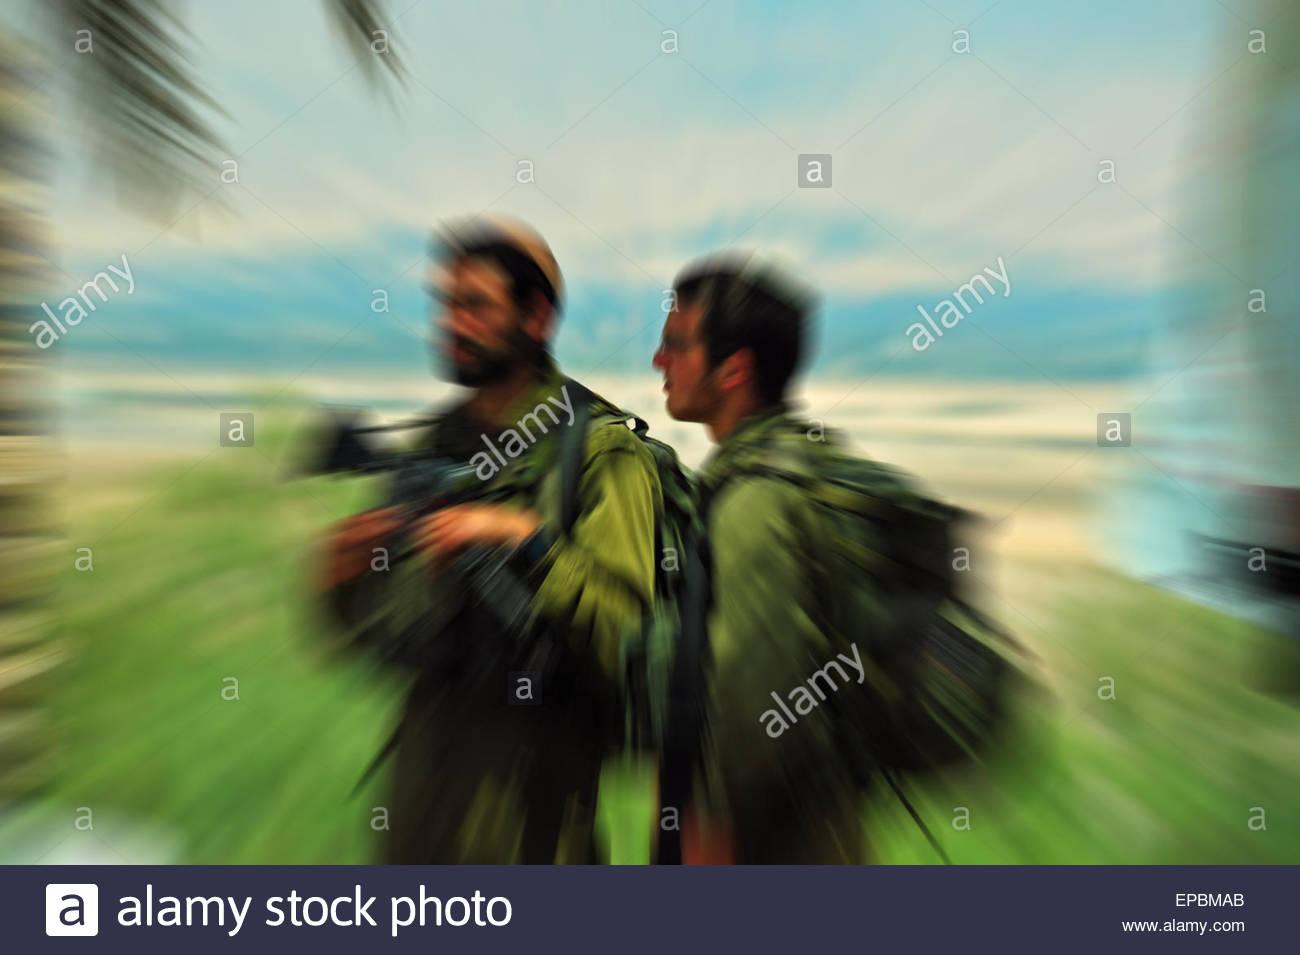 Israeli Border Patrol, Westbank, Israel. Editorial use only. - Stock Image